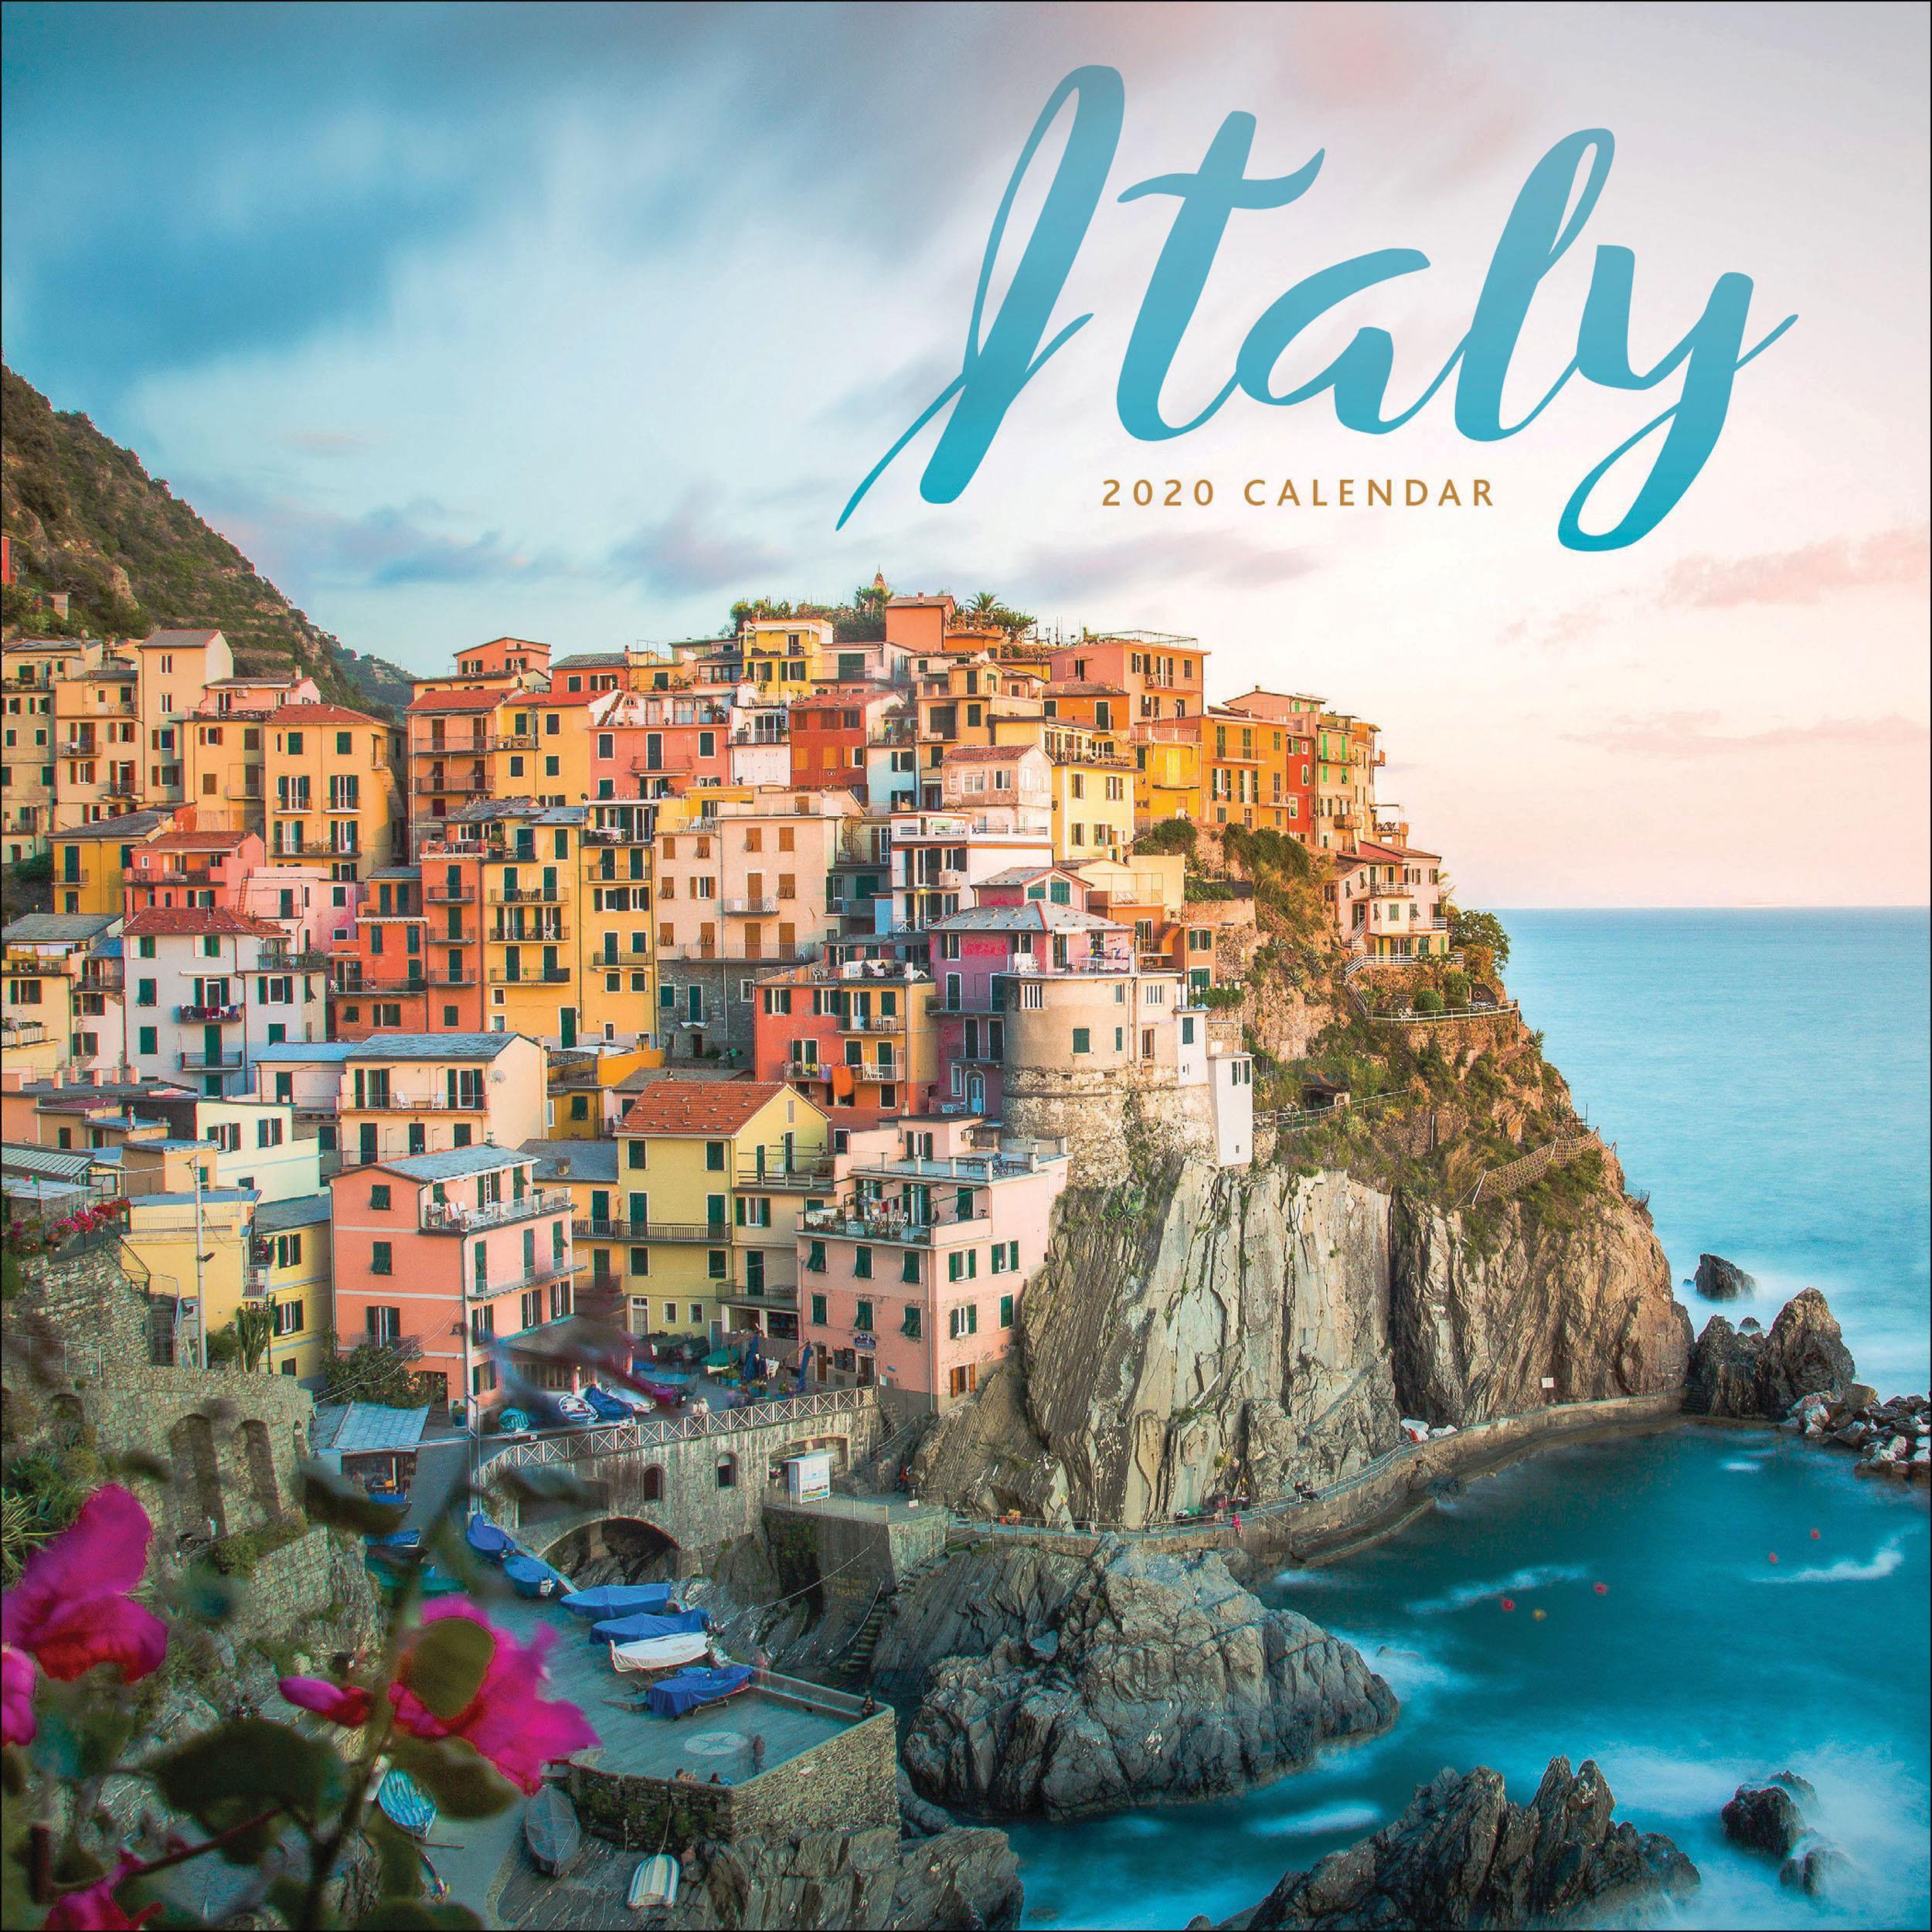 Italy Mini Calendar 2021 At Calendar Club Mini Calendars Italy Coastal Towns